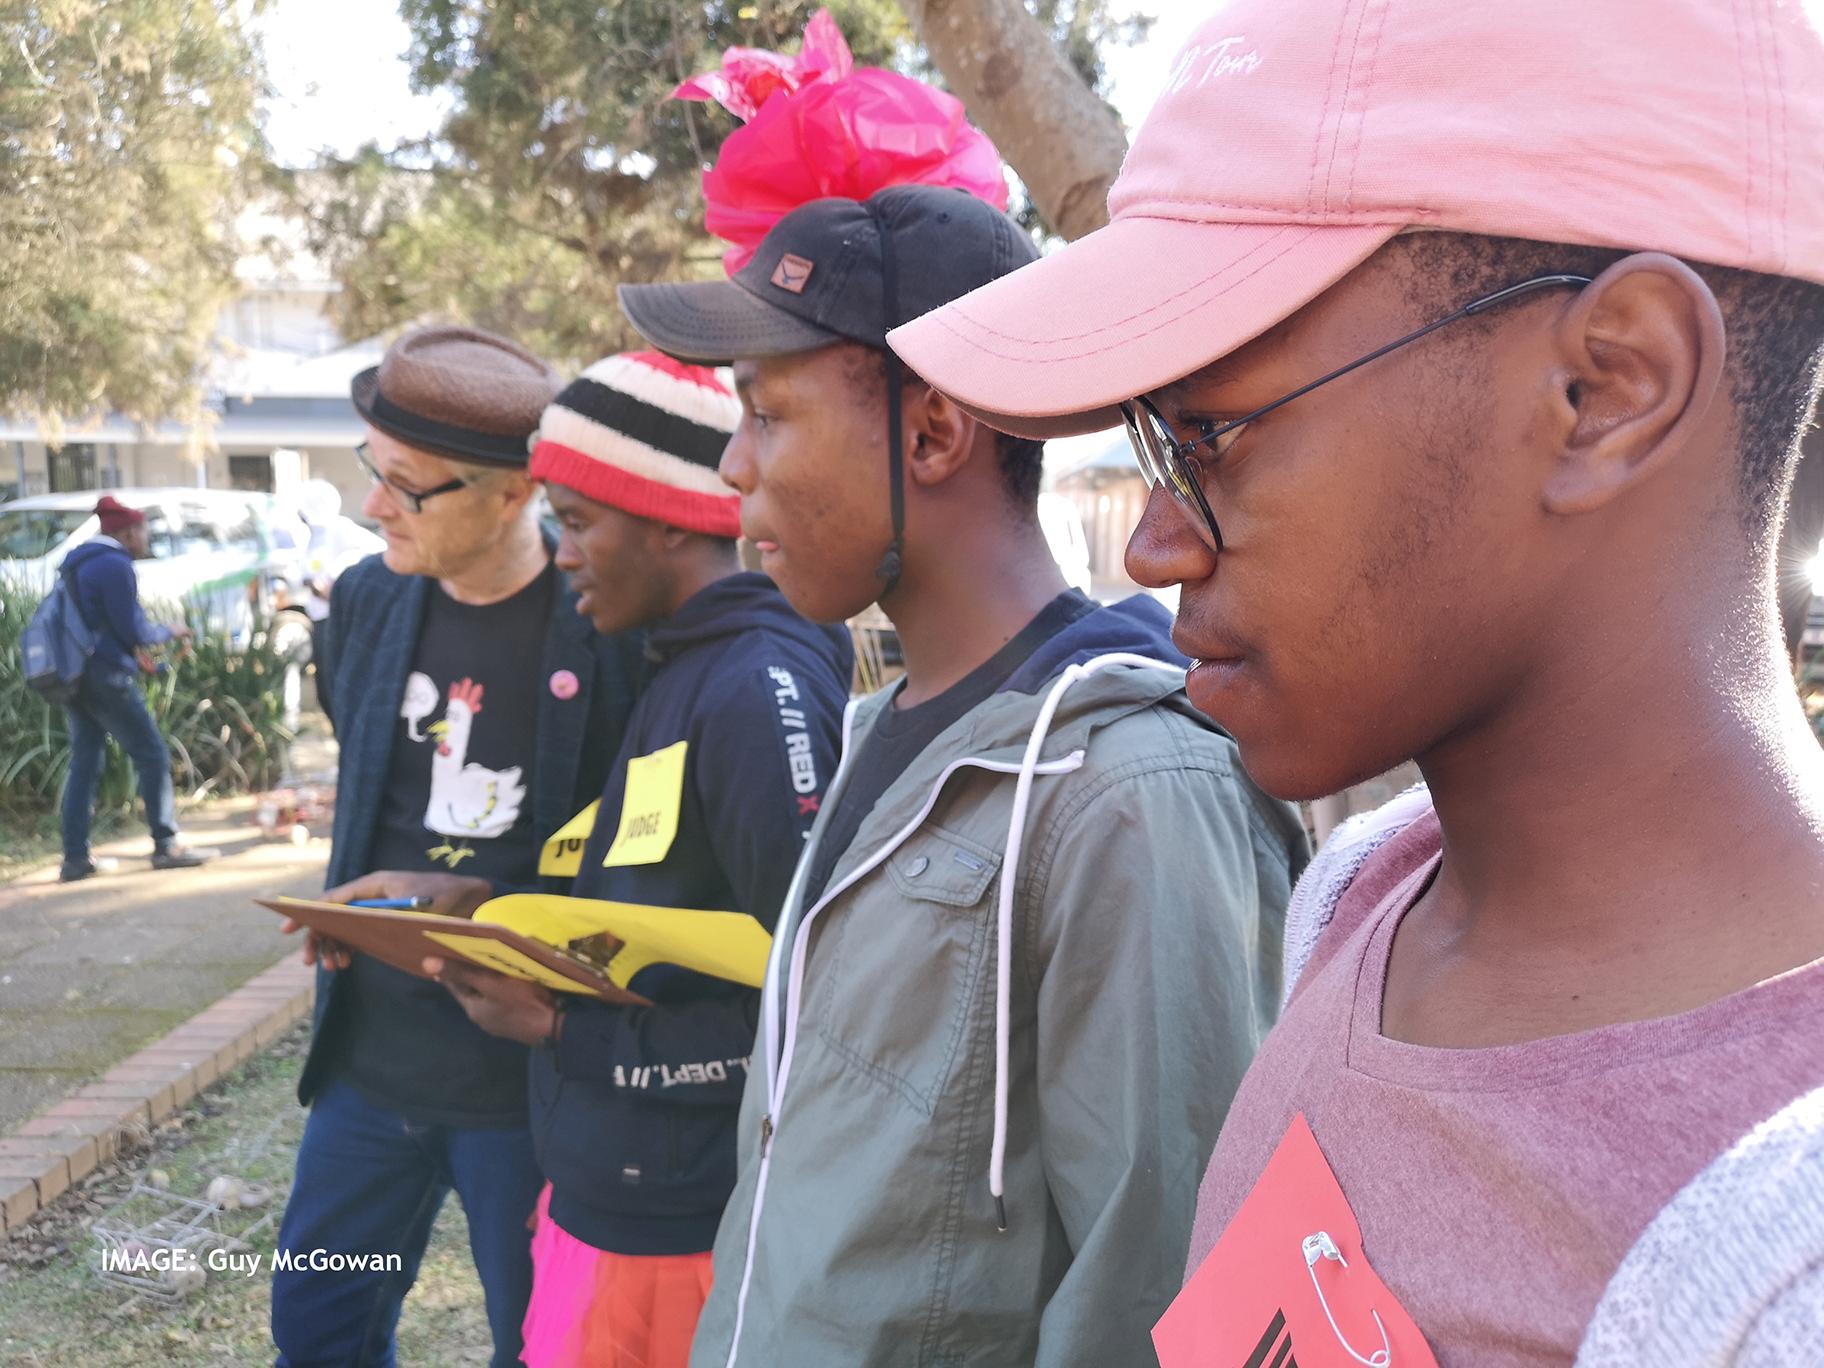 Judges Barry Downard, Mzwa Mokoena, Philani and Sihle Ngcobo at Trashion Show 2019 Howick KZN Midlands